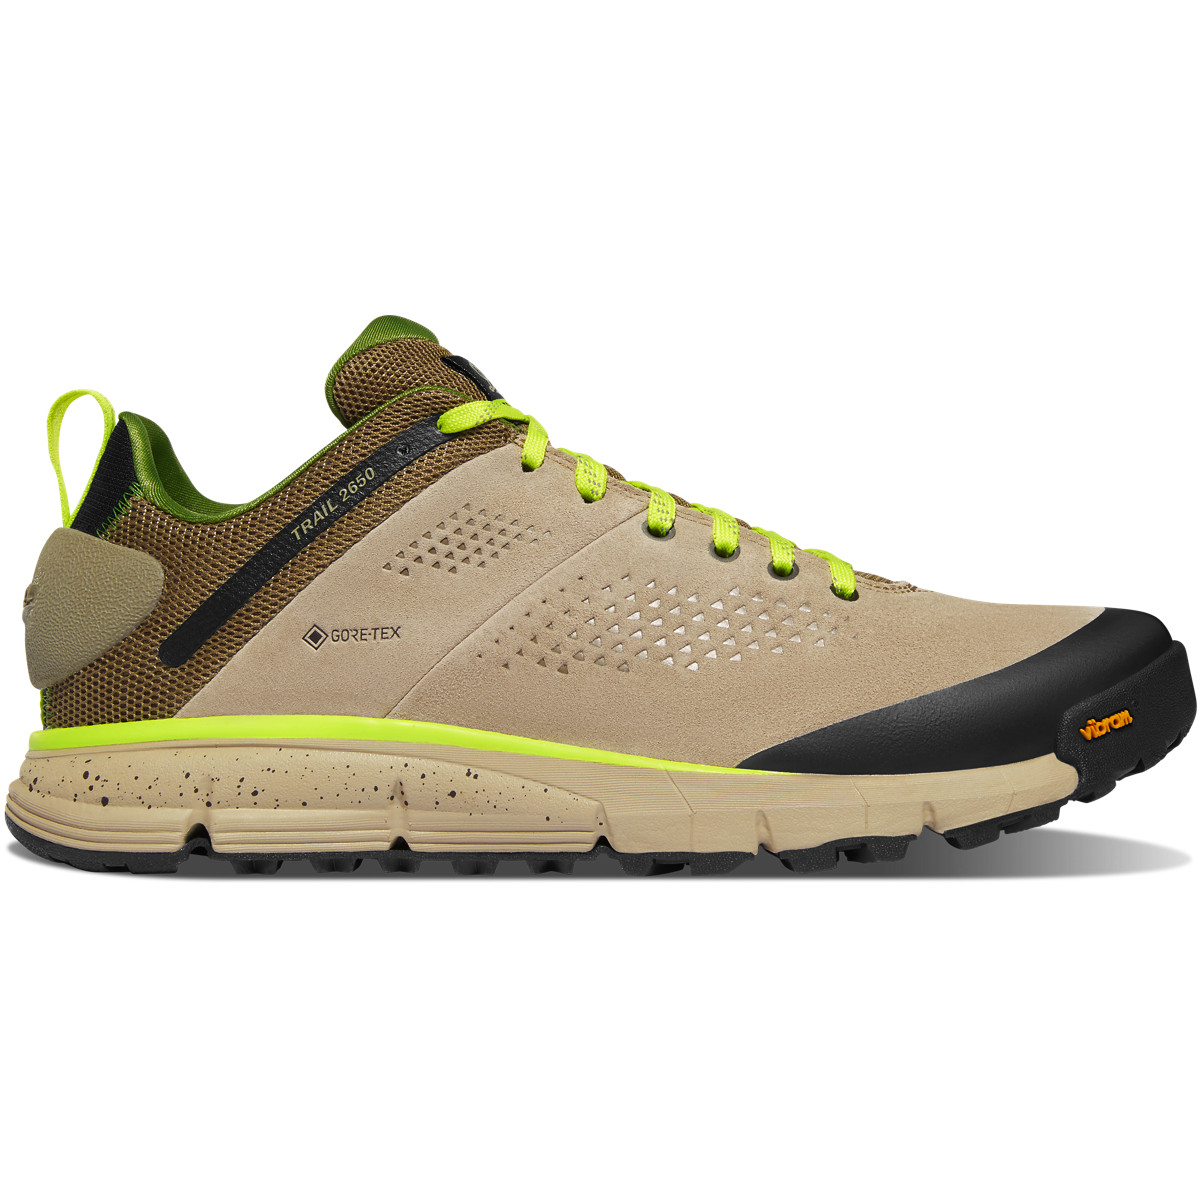 "Trail 2650 3"" Tan/Meadow Greens GTX"